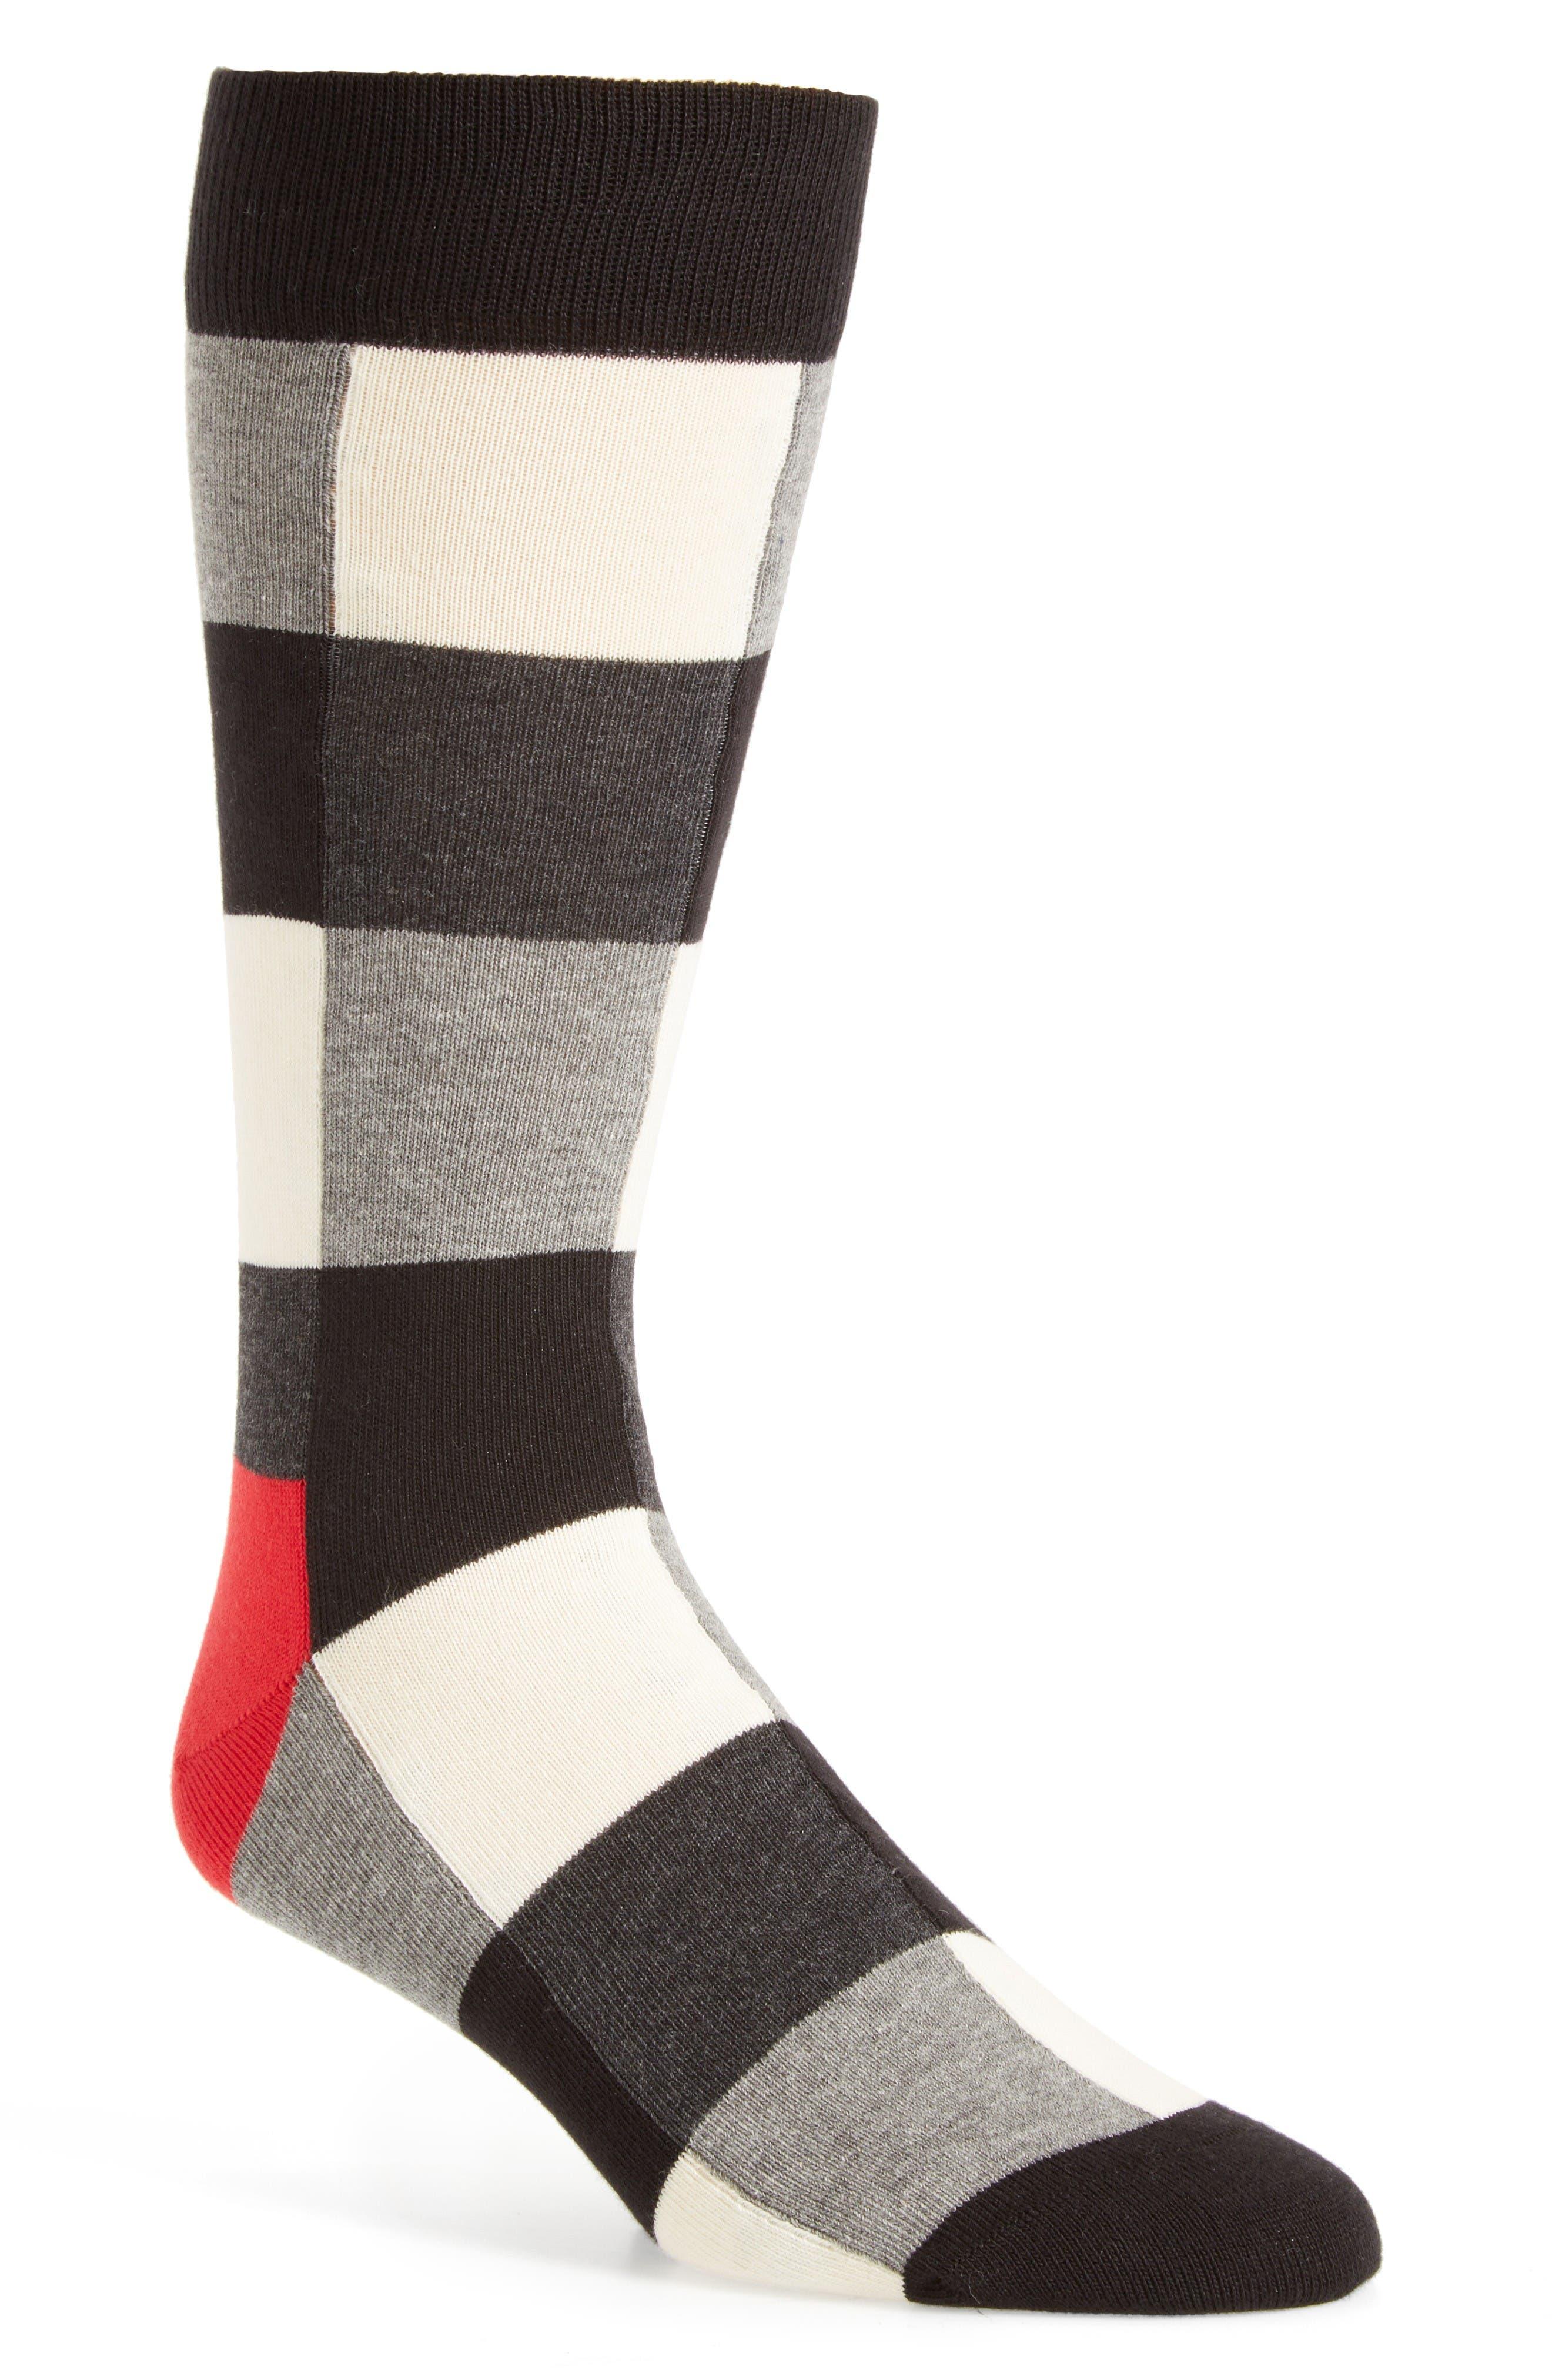 Alternate Image 1 Selected - Happy Socks Check Socks